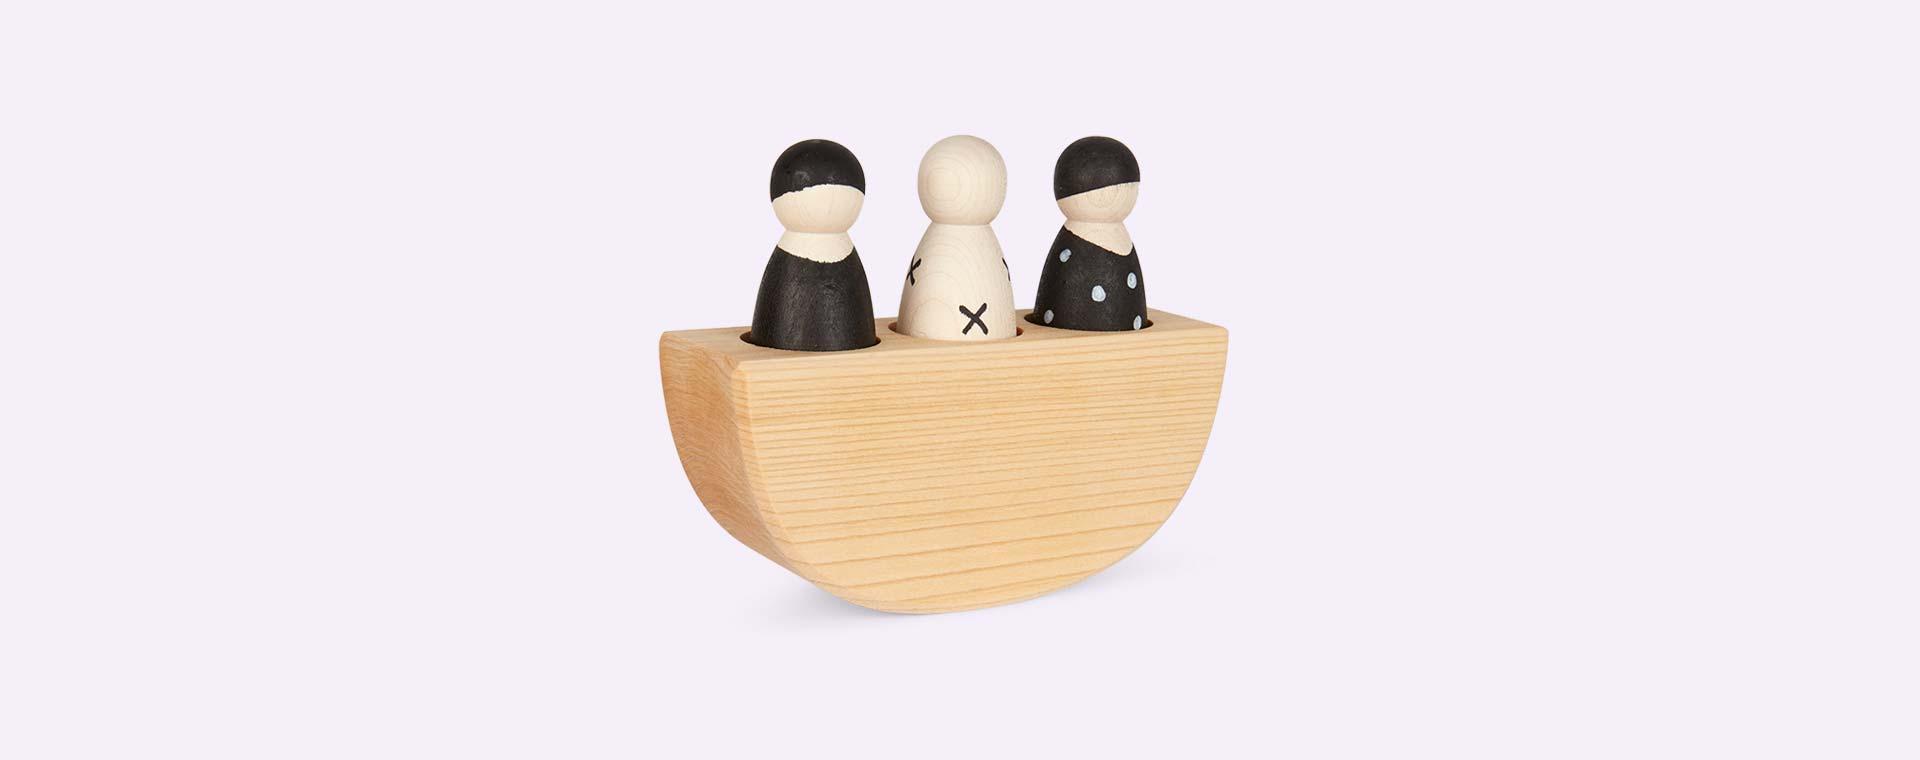 Monochrome Grimm's 3 In A Boat